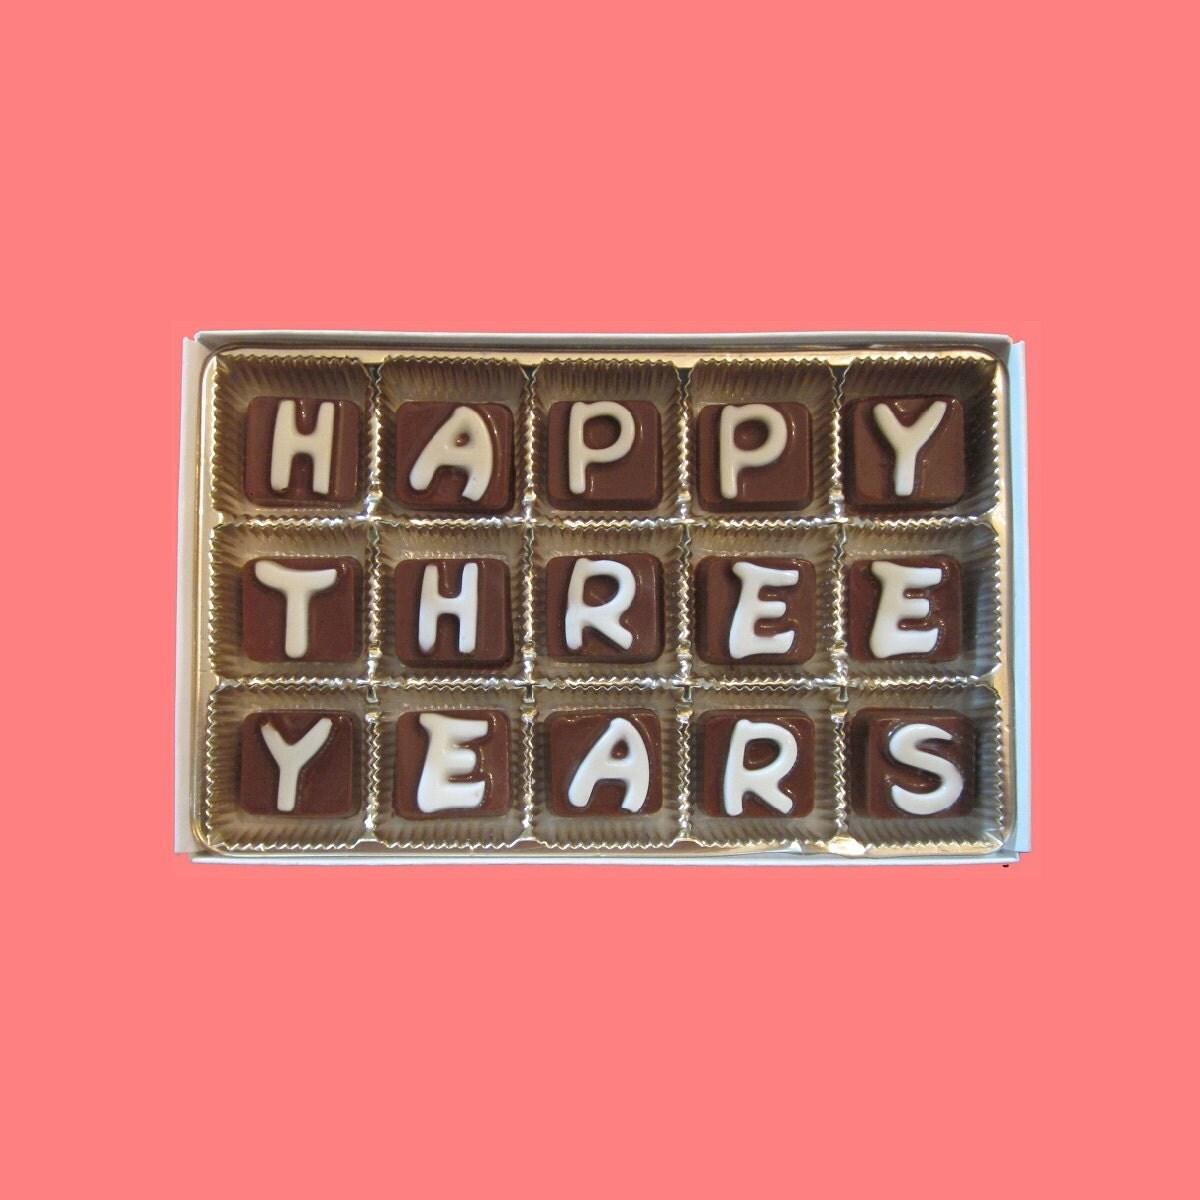 3rd anniversary card | Etsy